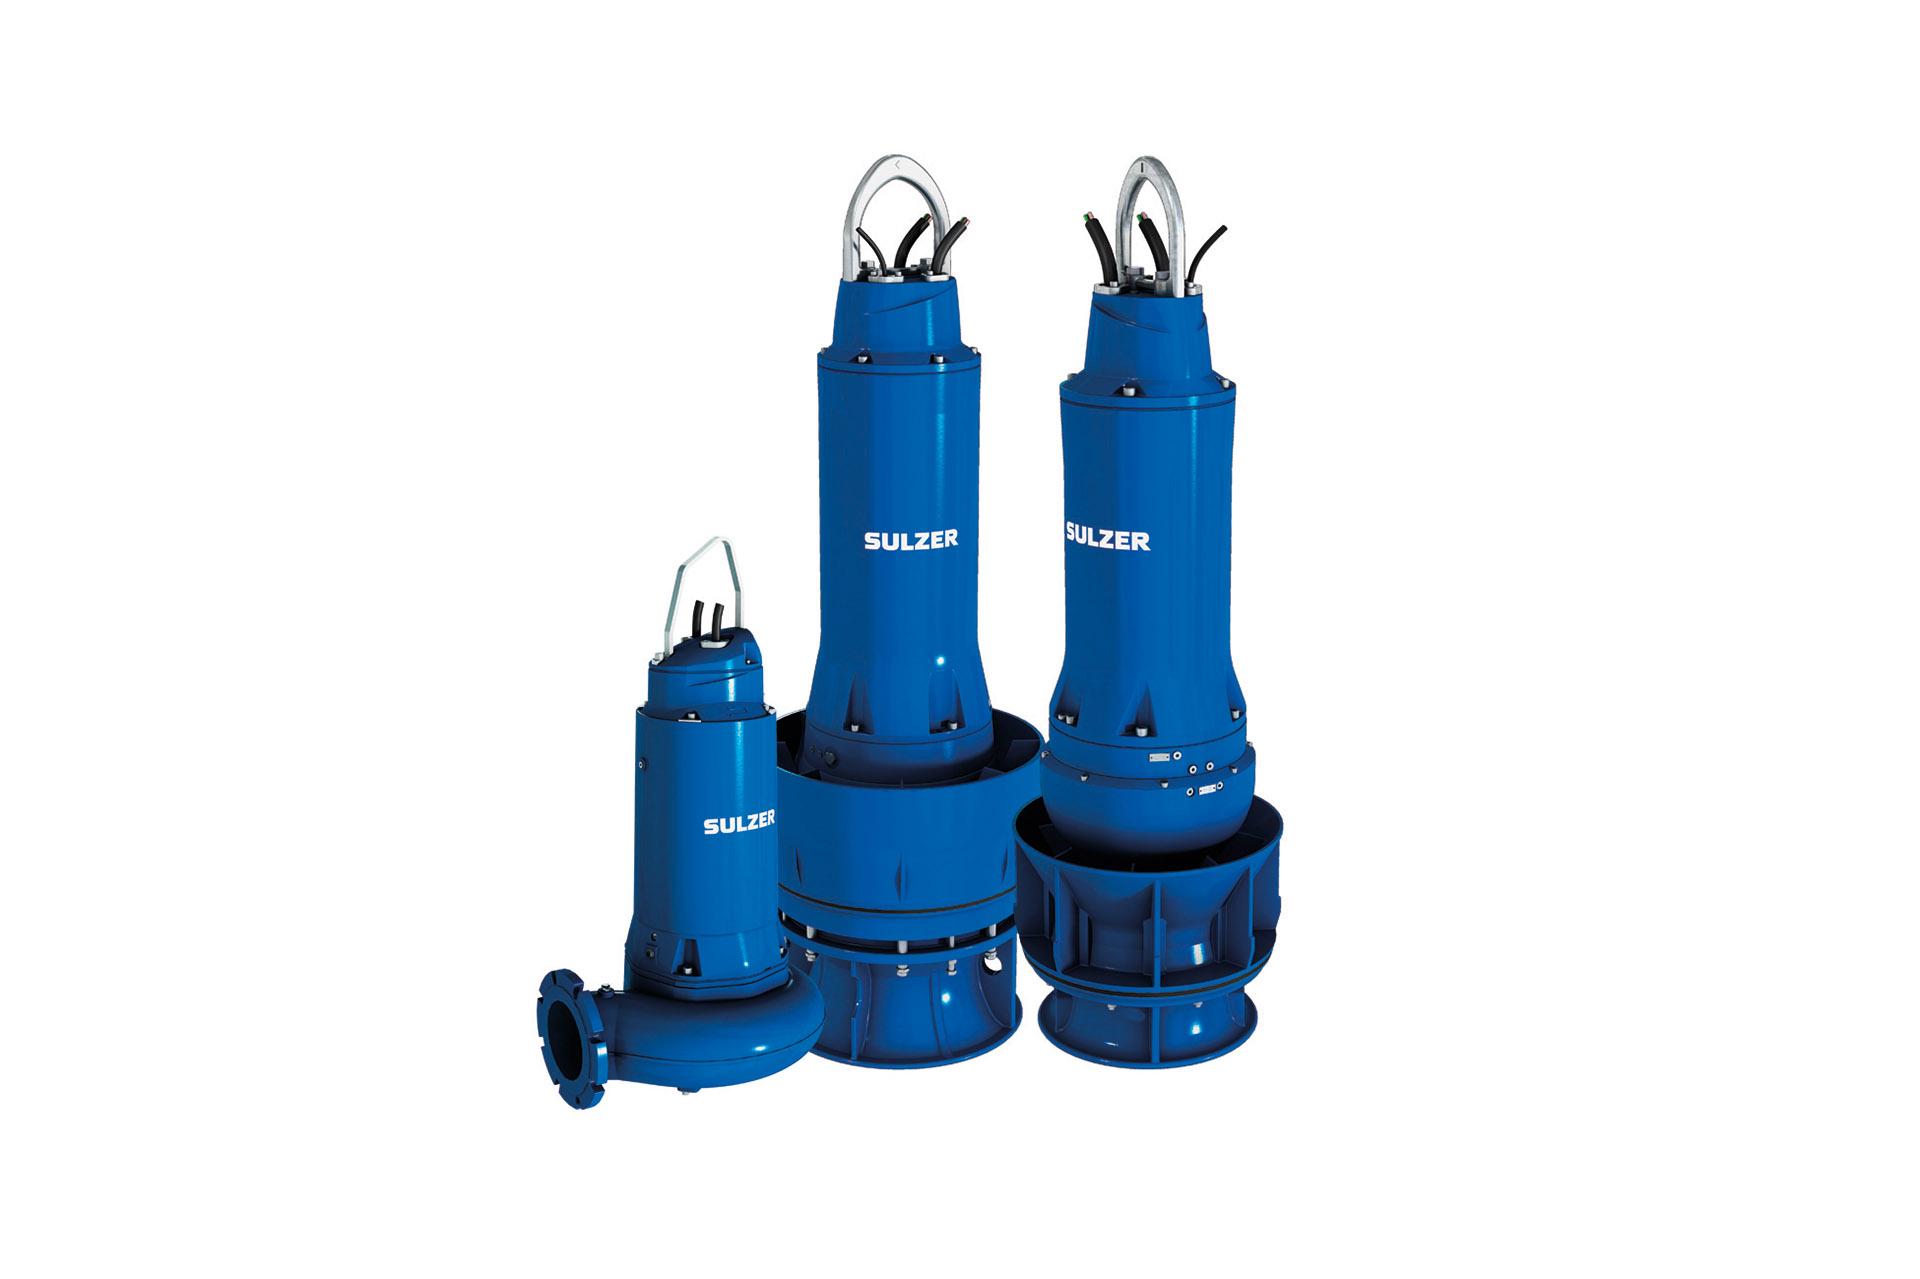 Submersible pumps | Sulzer